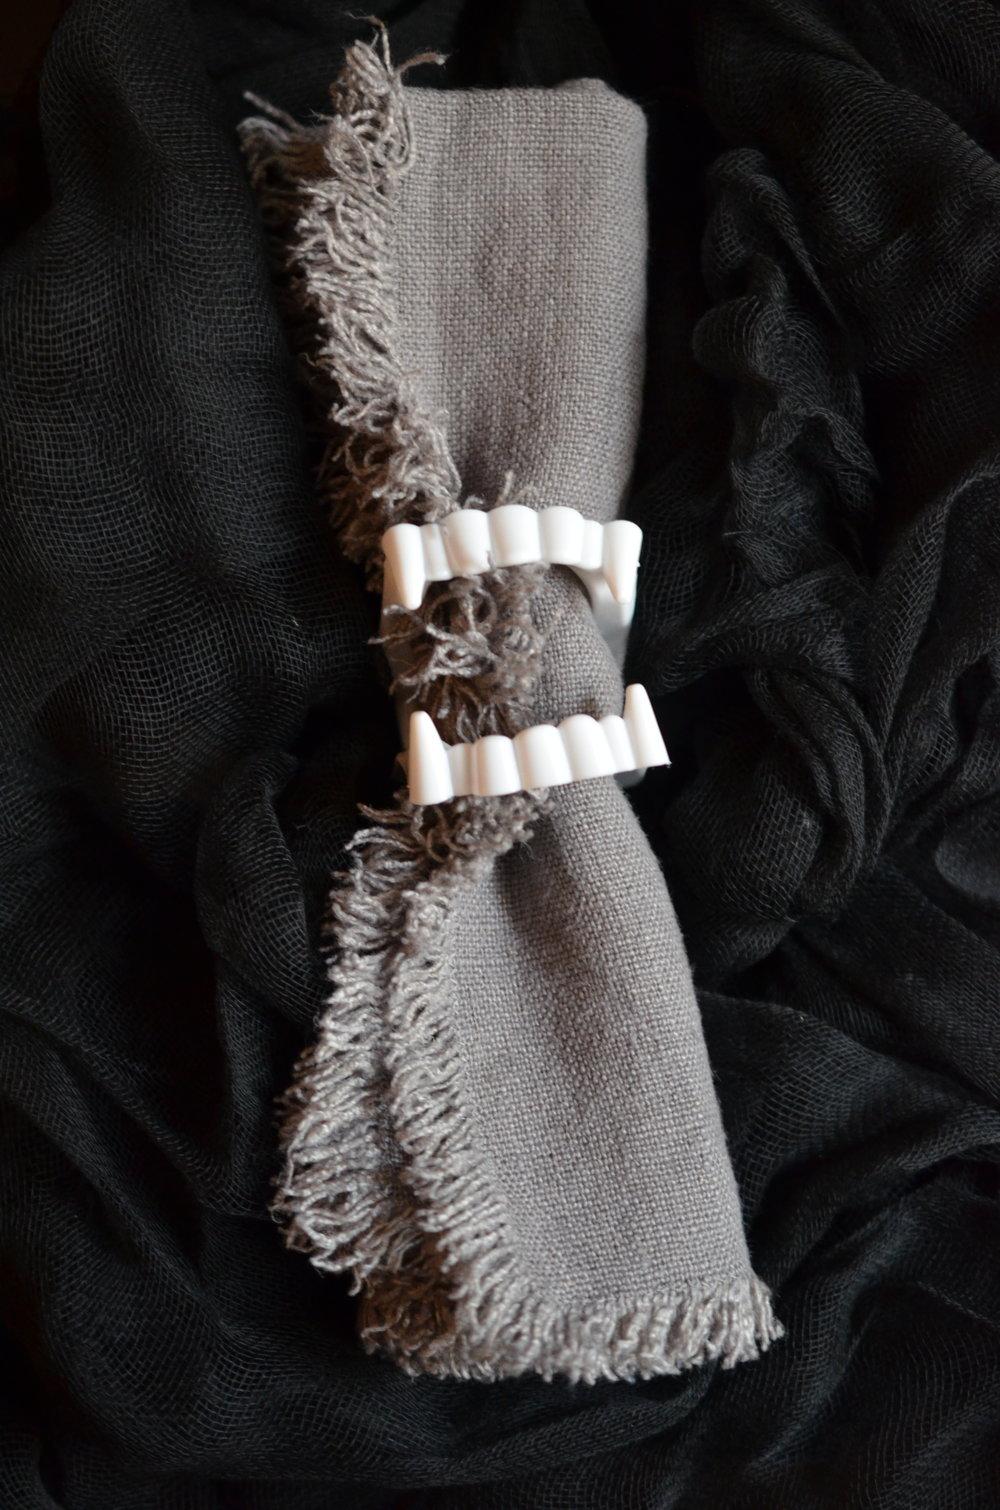 Dracula Napkin Rings